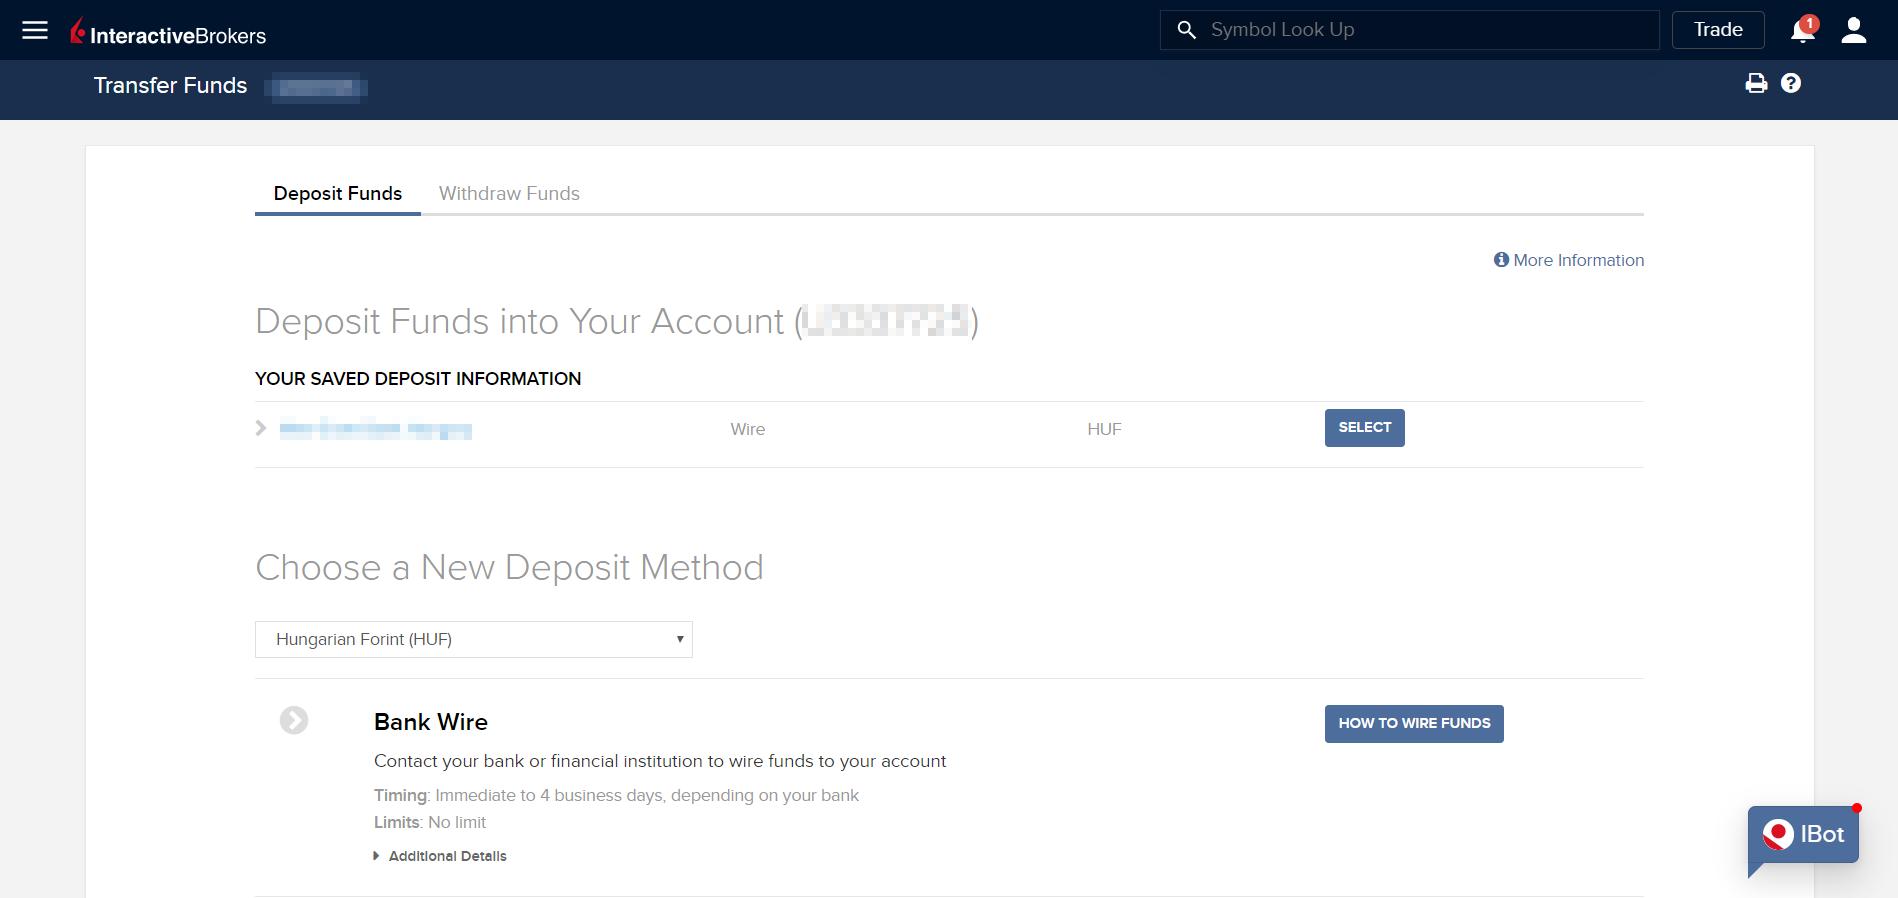 interactive brokers huf gur huberman bitcoin